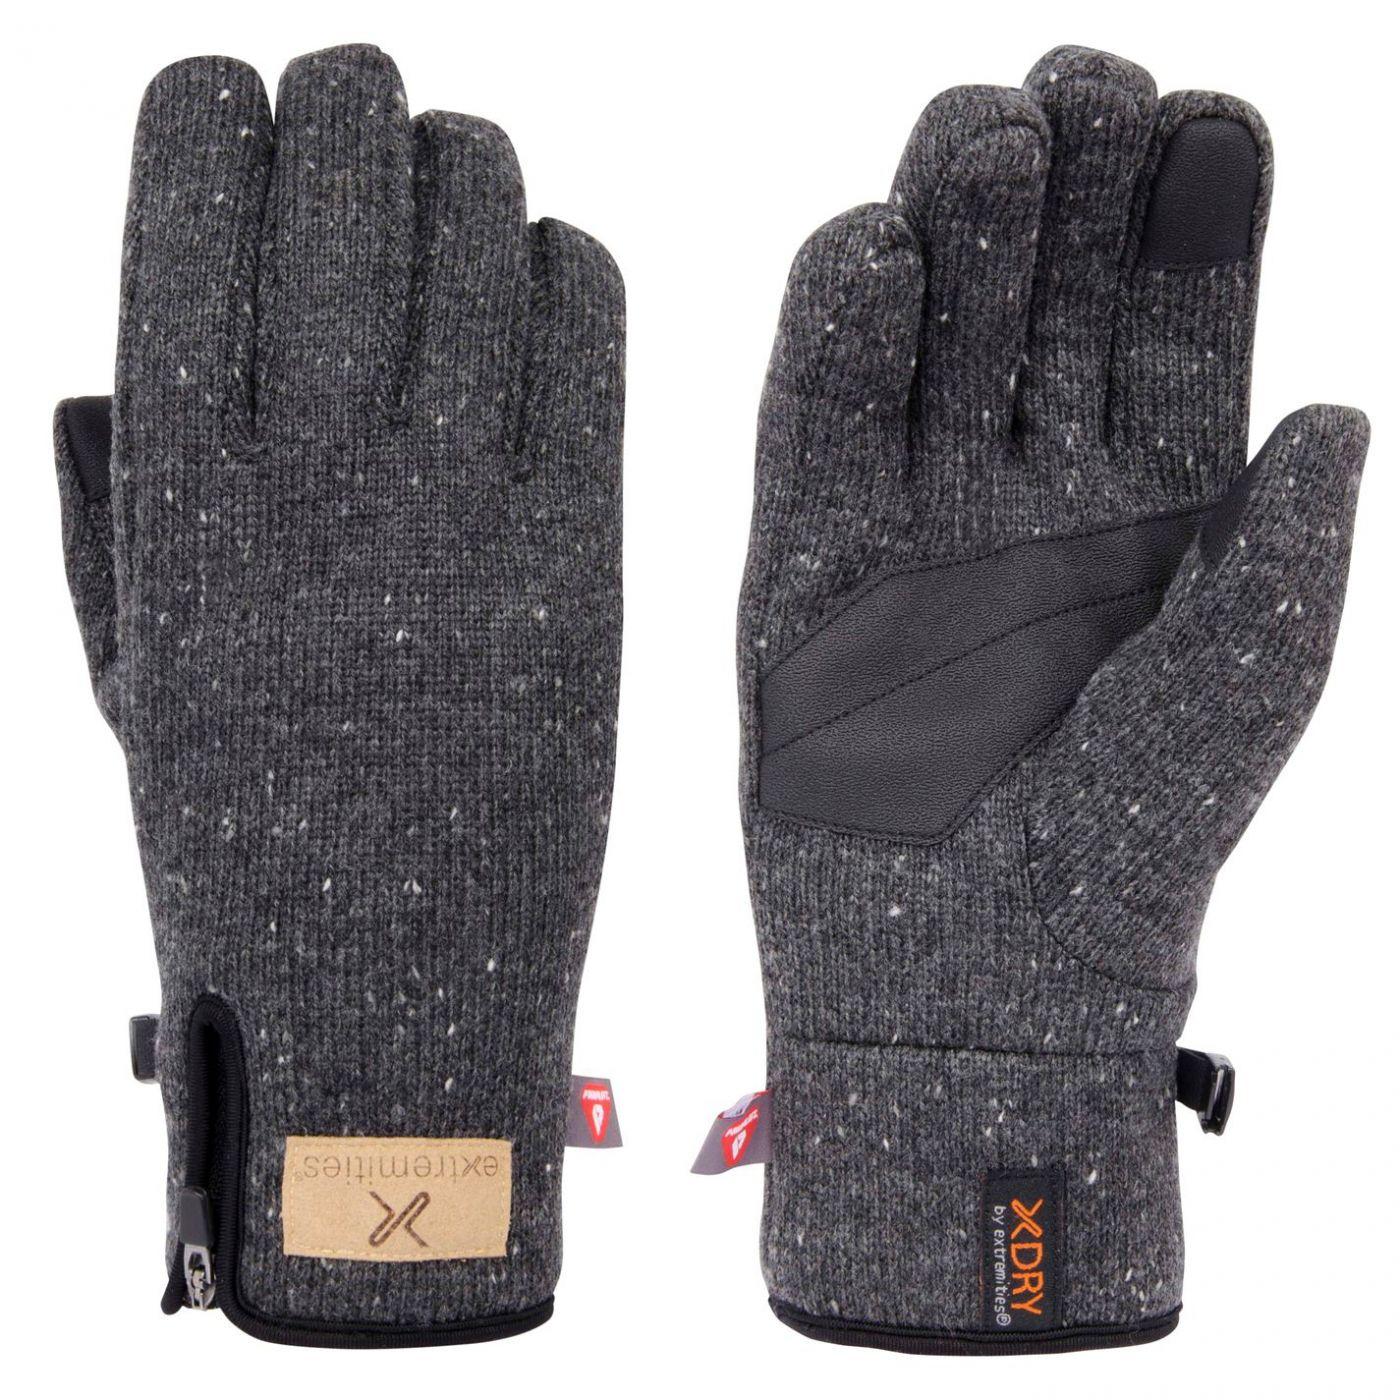 Extremities Furnace Pro Glv 91